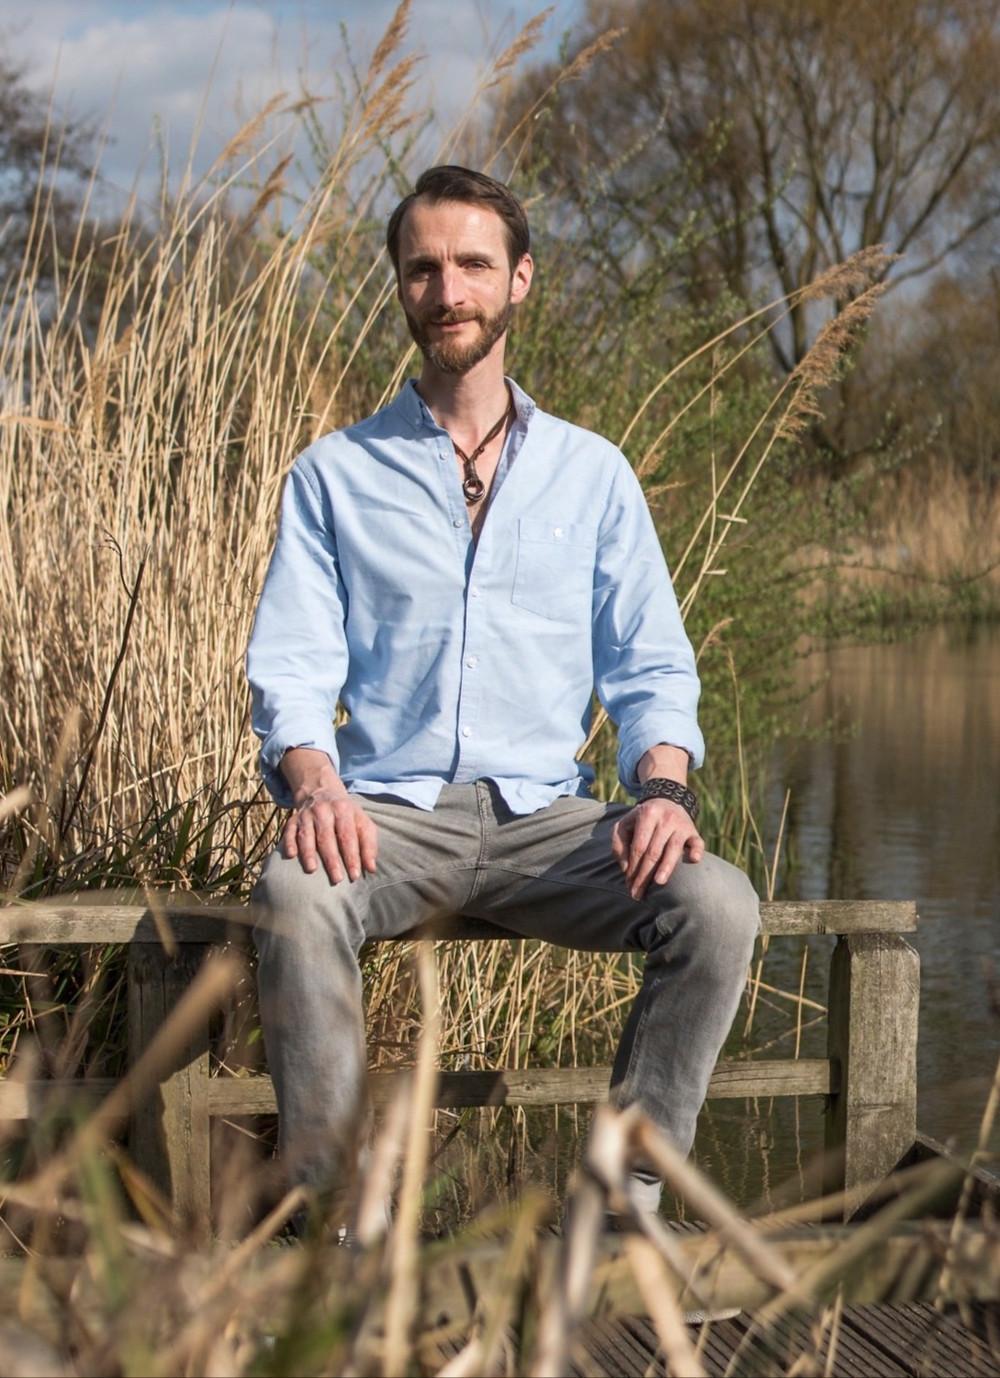 Nick Kientsch, meditation teacher of Who am I? Virtual Retreat for gay men